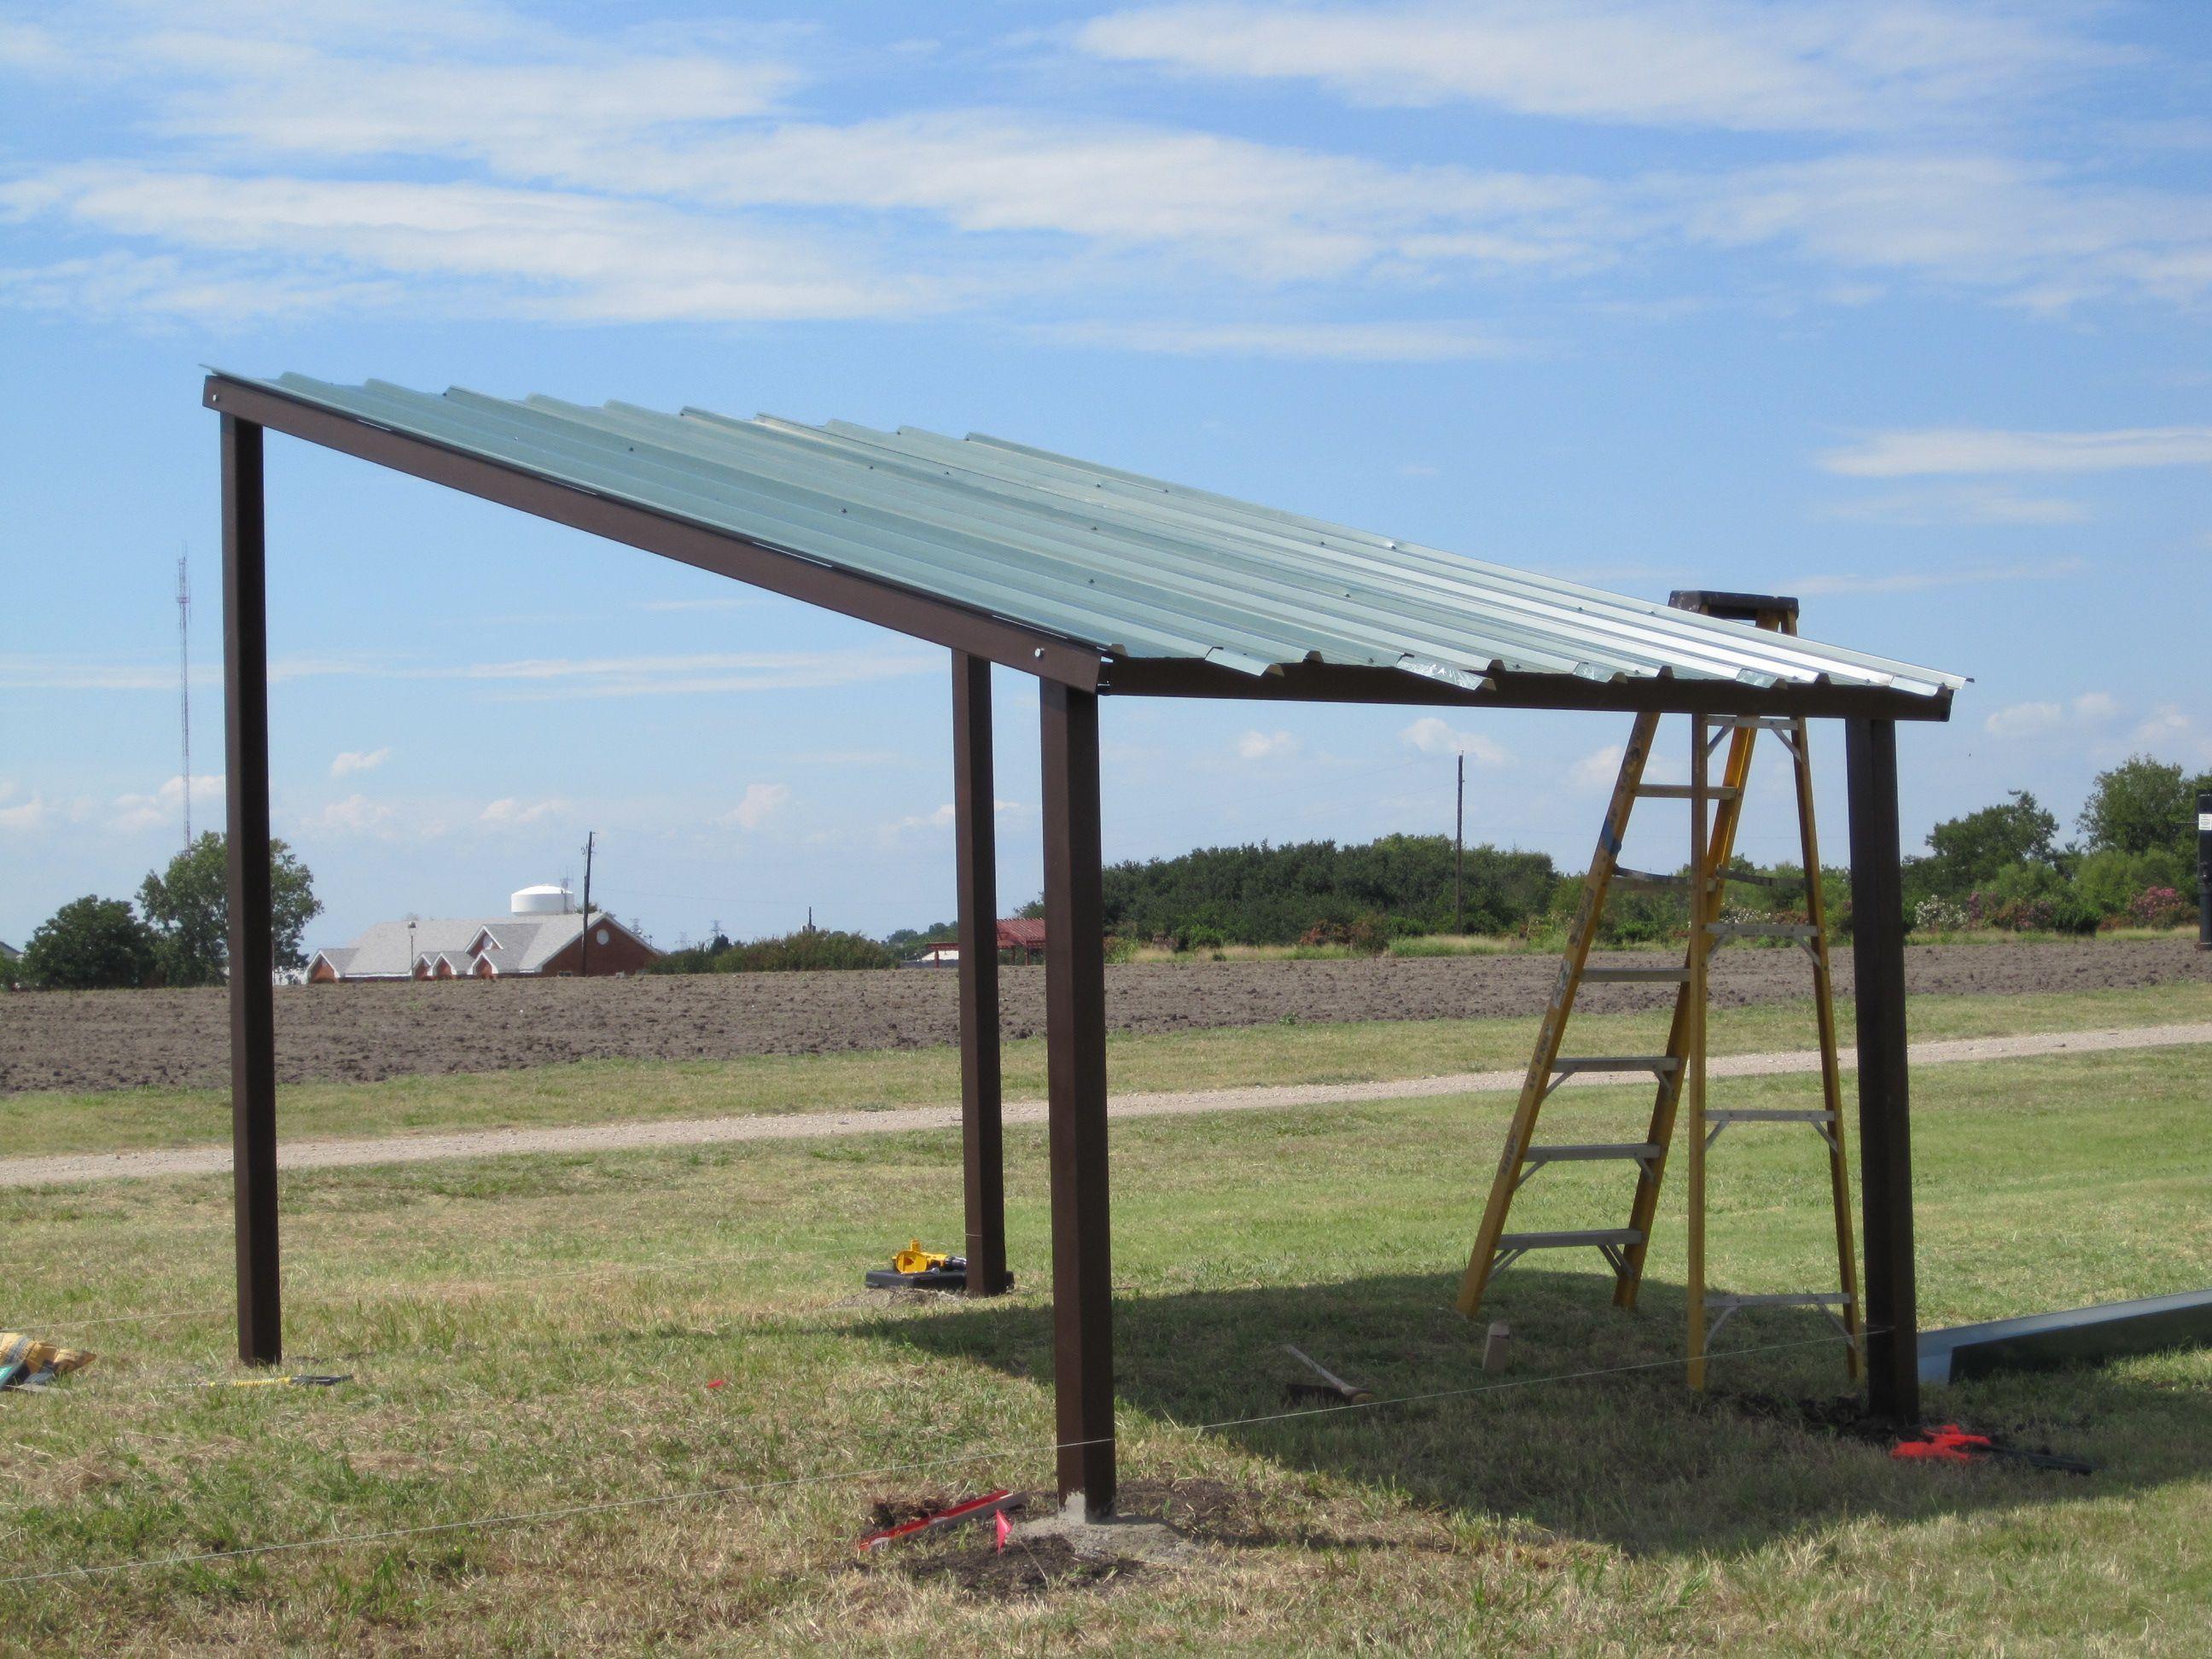 Catchment Area Rainwater Harvesting Pergola Pergola Plans Diy Rain Water Collection